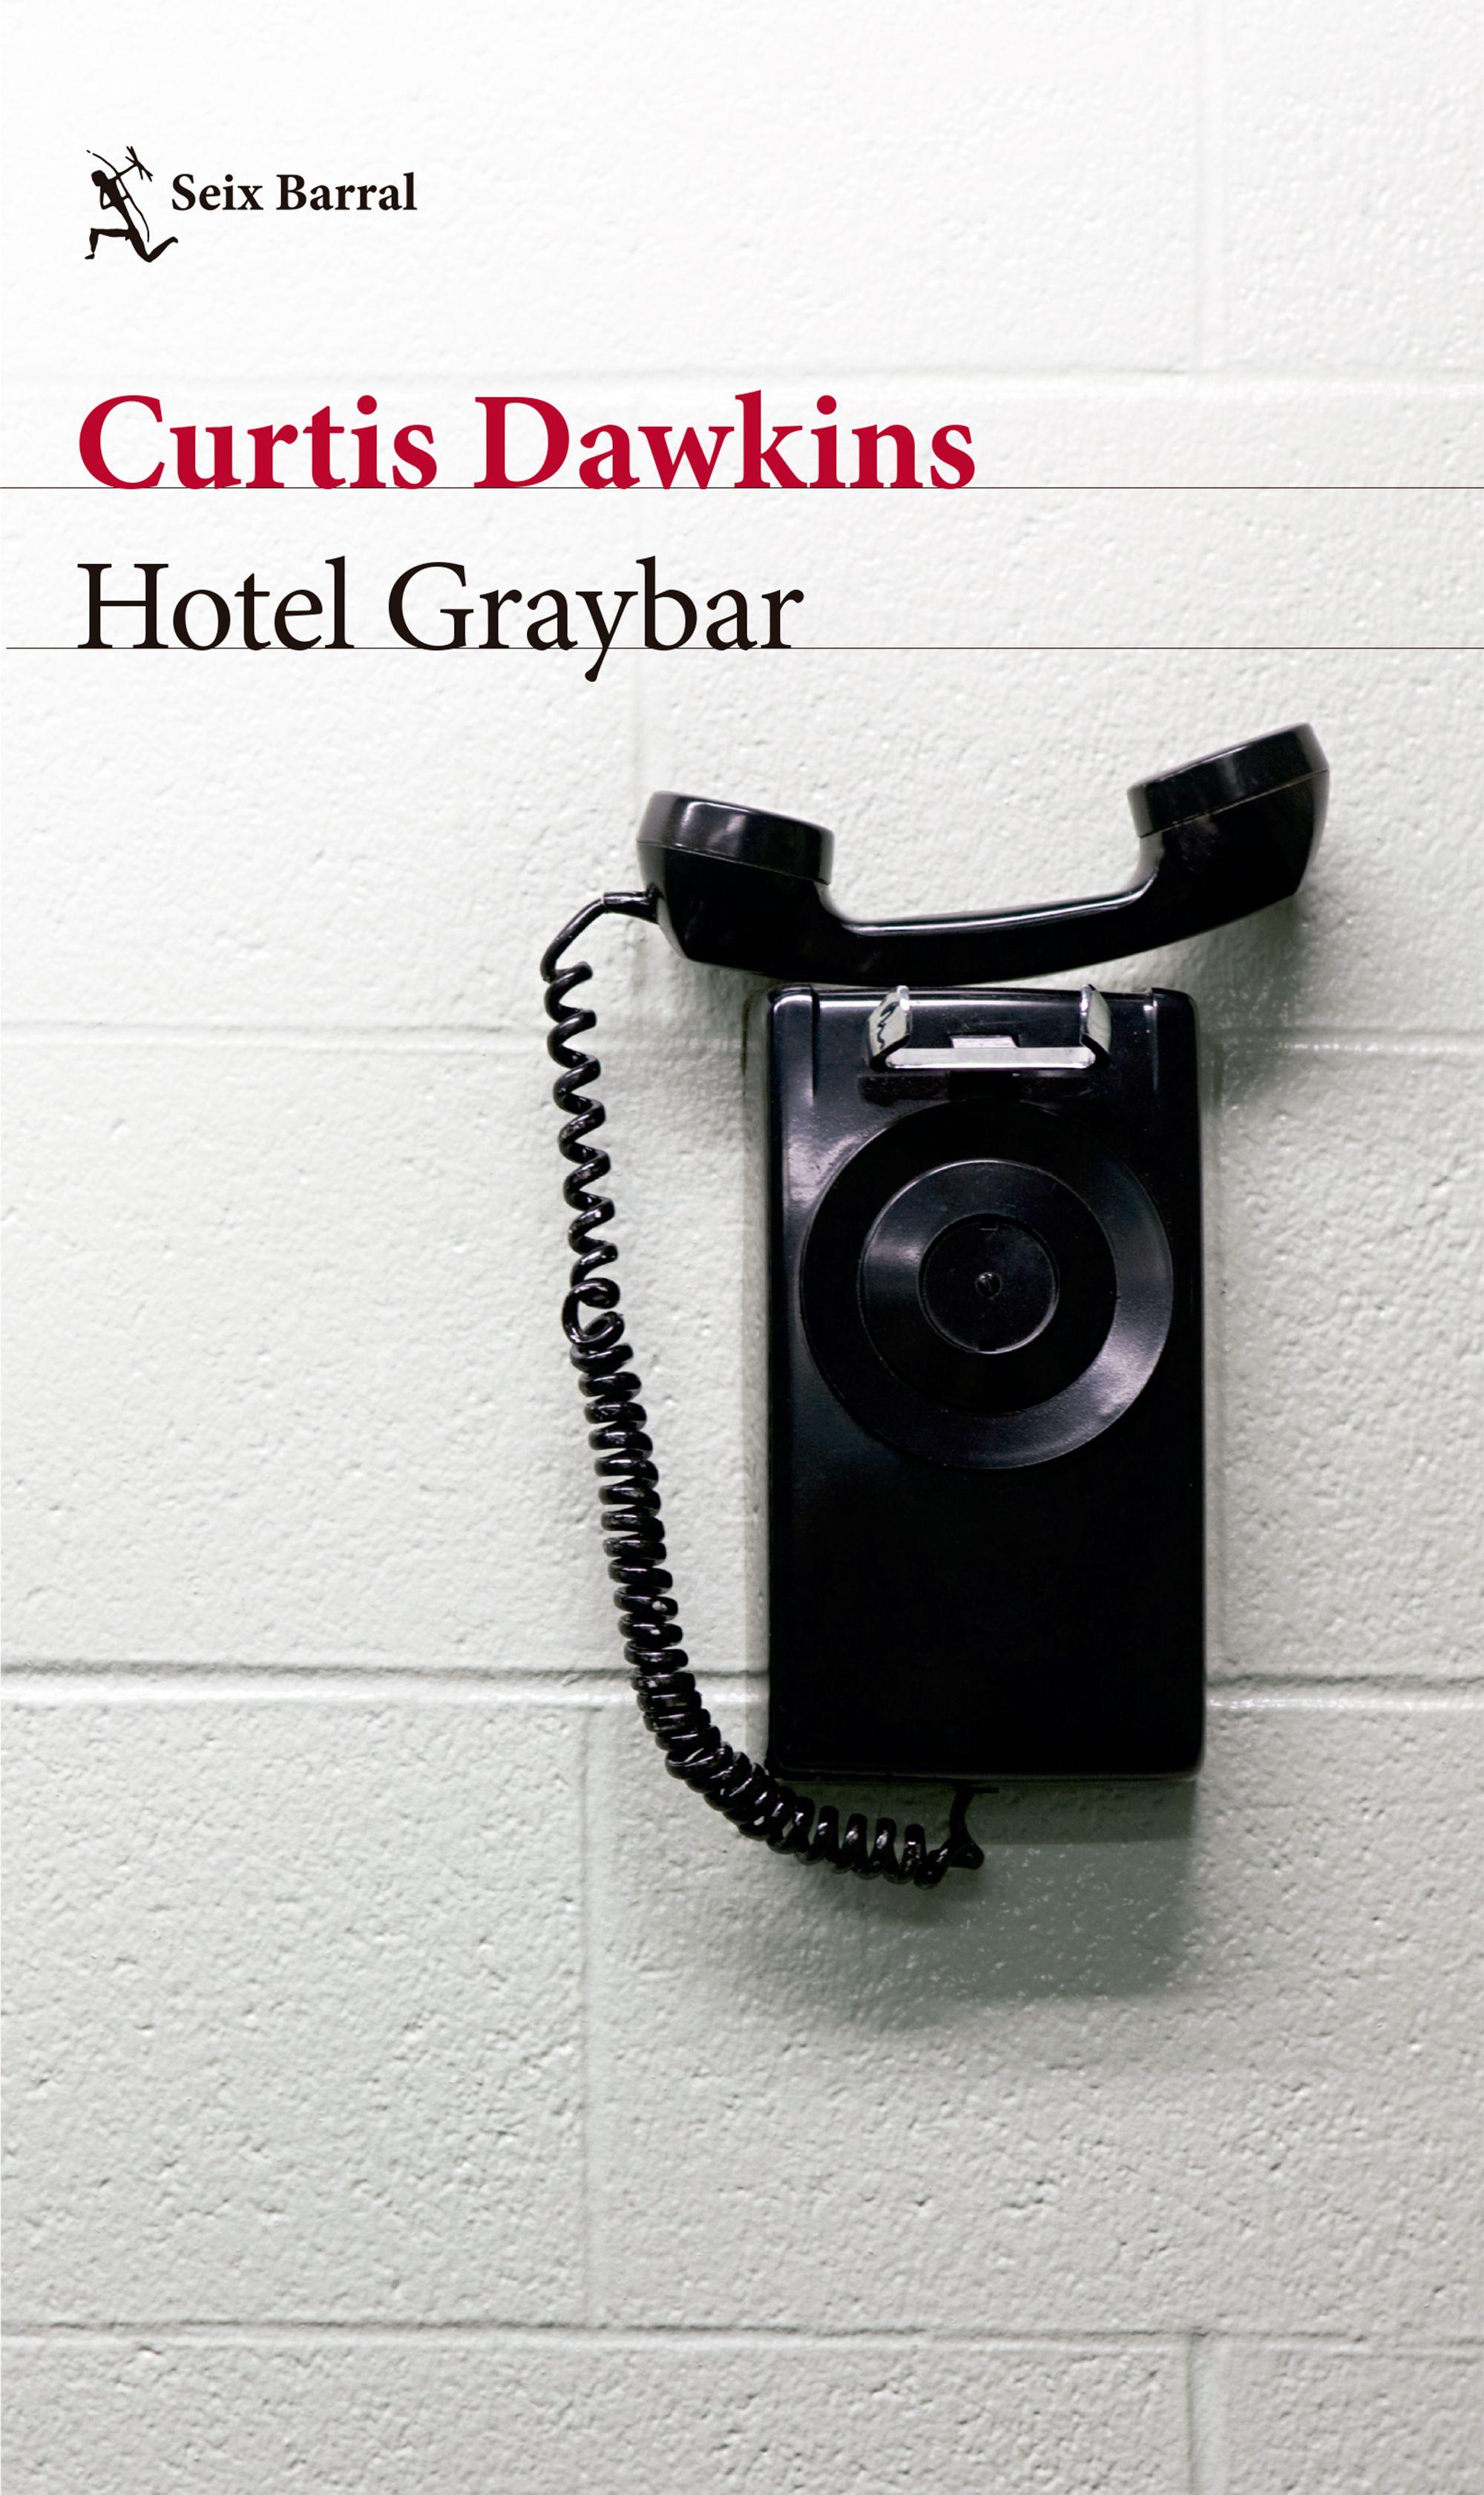 Hotel Graybar - Curtis Dawkins - Seix Barral